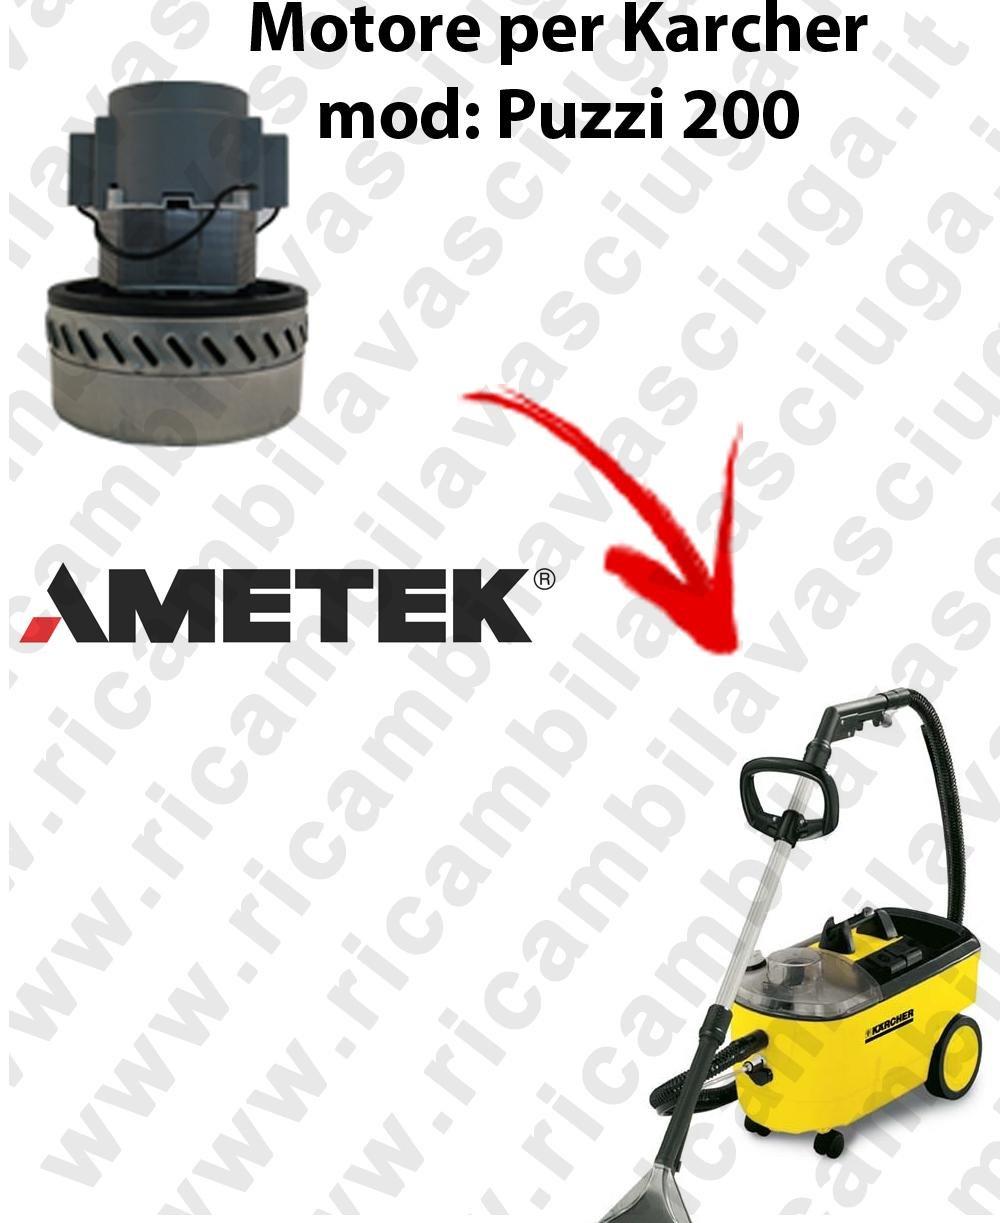 Karcher Puzzi 200 Suction Ametek Motor for Vacuum Cleaner